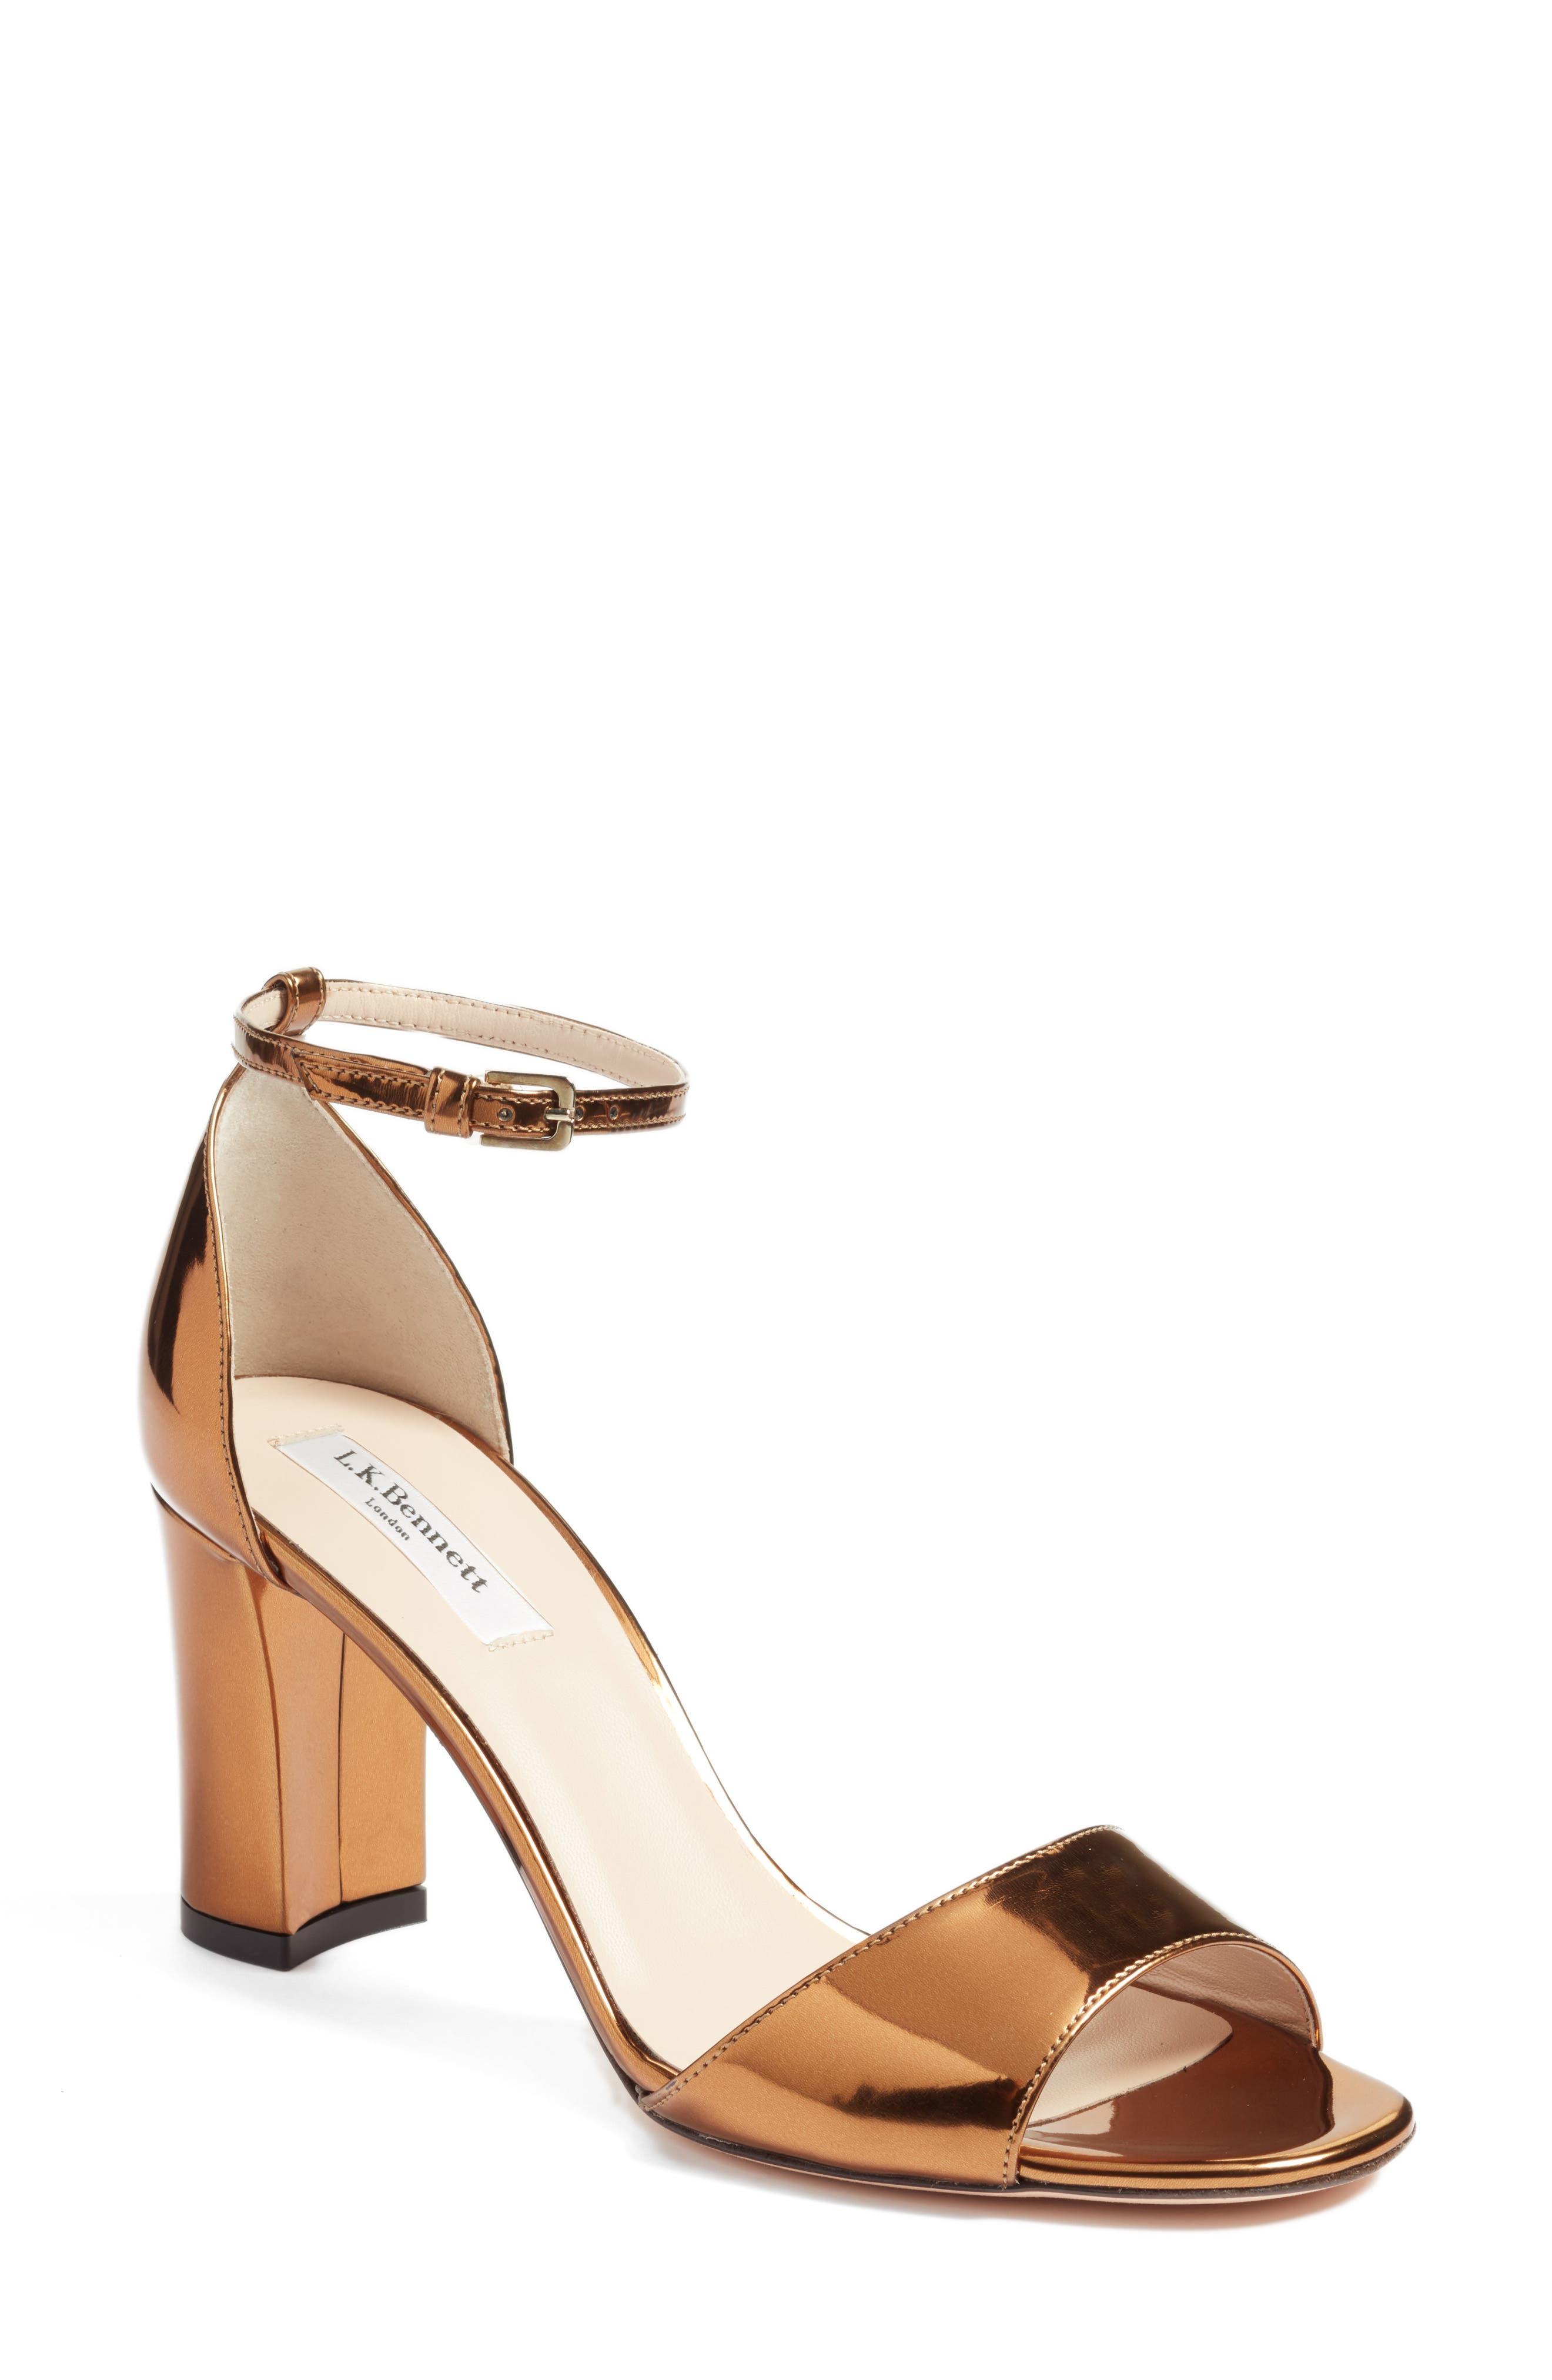 'Helena' Ankle Strap Block Heel Sandal,                         Main,                         color, 710